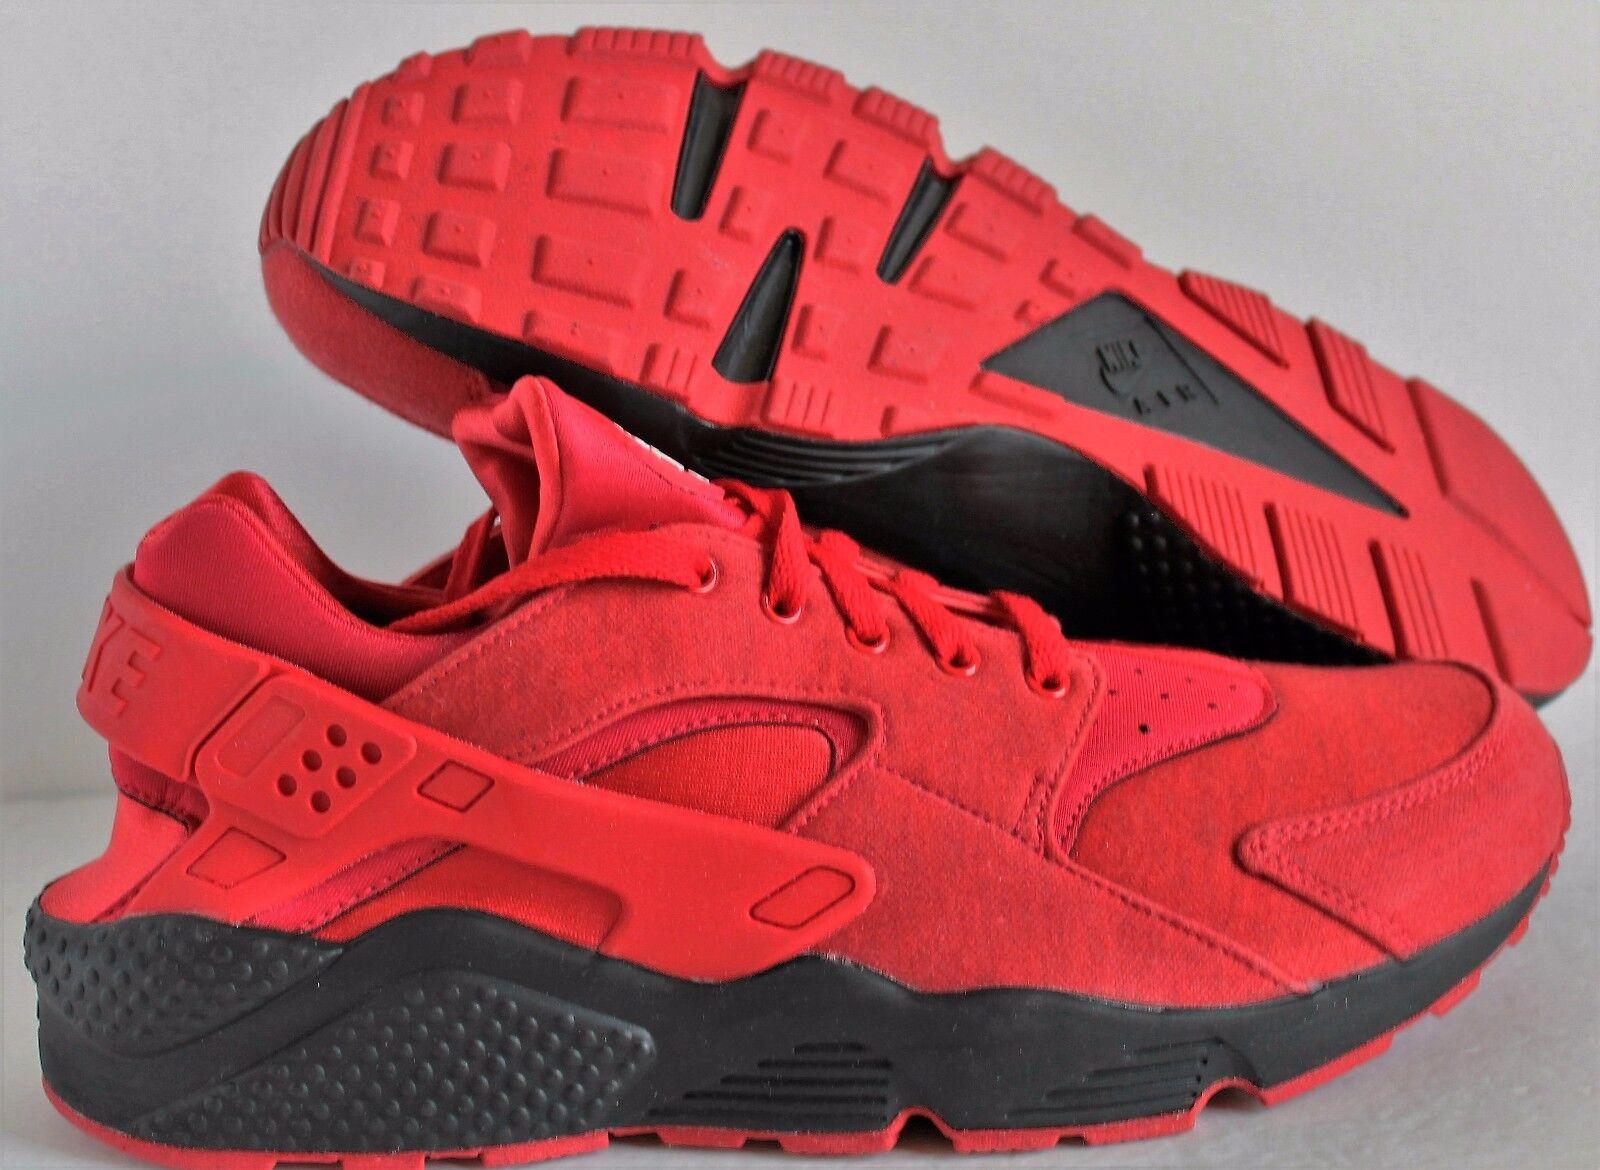 Nike Men's Air Huarache Tech Fleece Premium ID  Red-Black  SZ 12.5